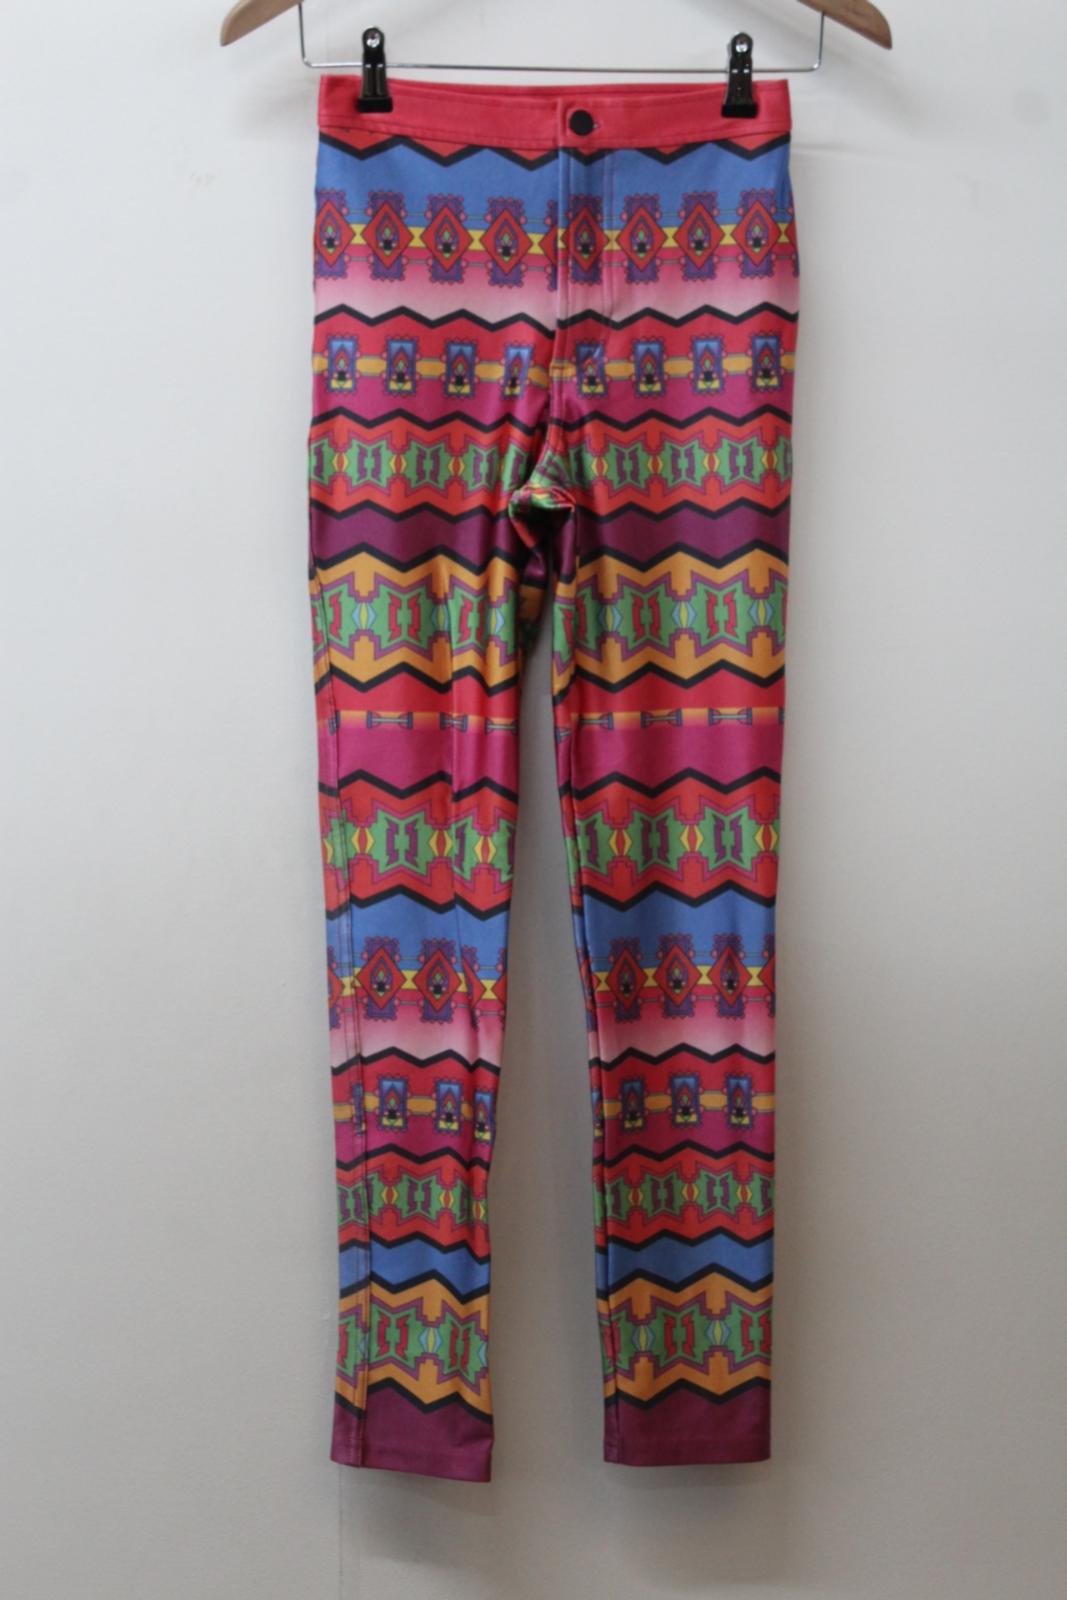 Multicolore Pants Max Pantalons Imprimante For American Pantalons S Disco Neo Apparel xX40wH01